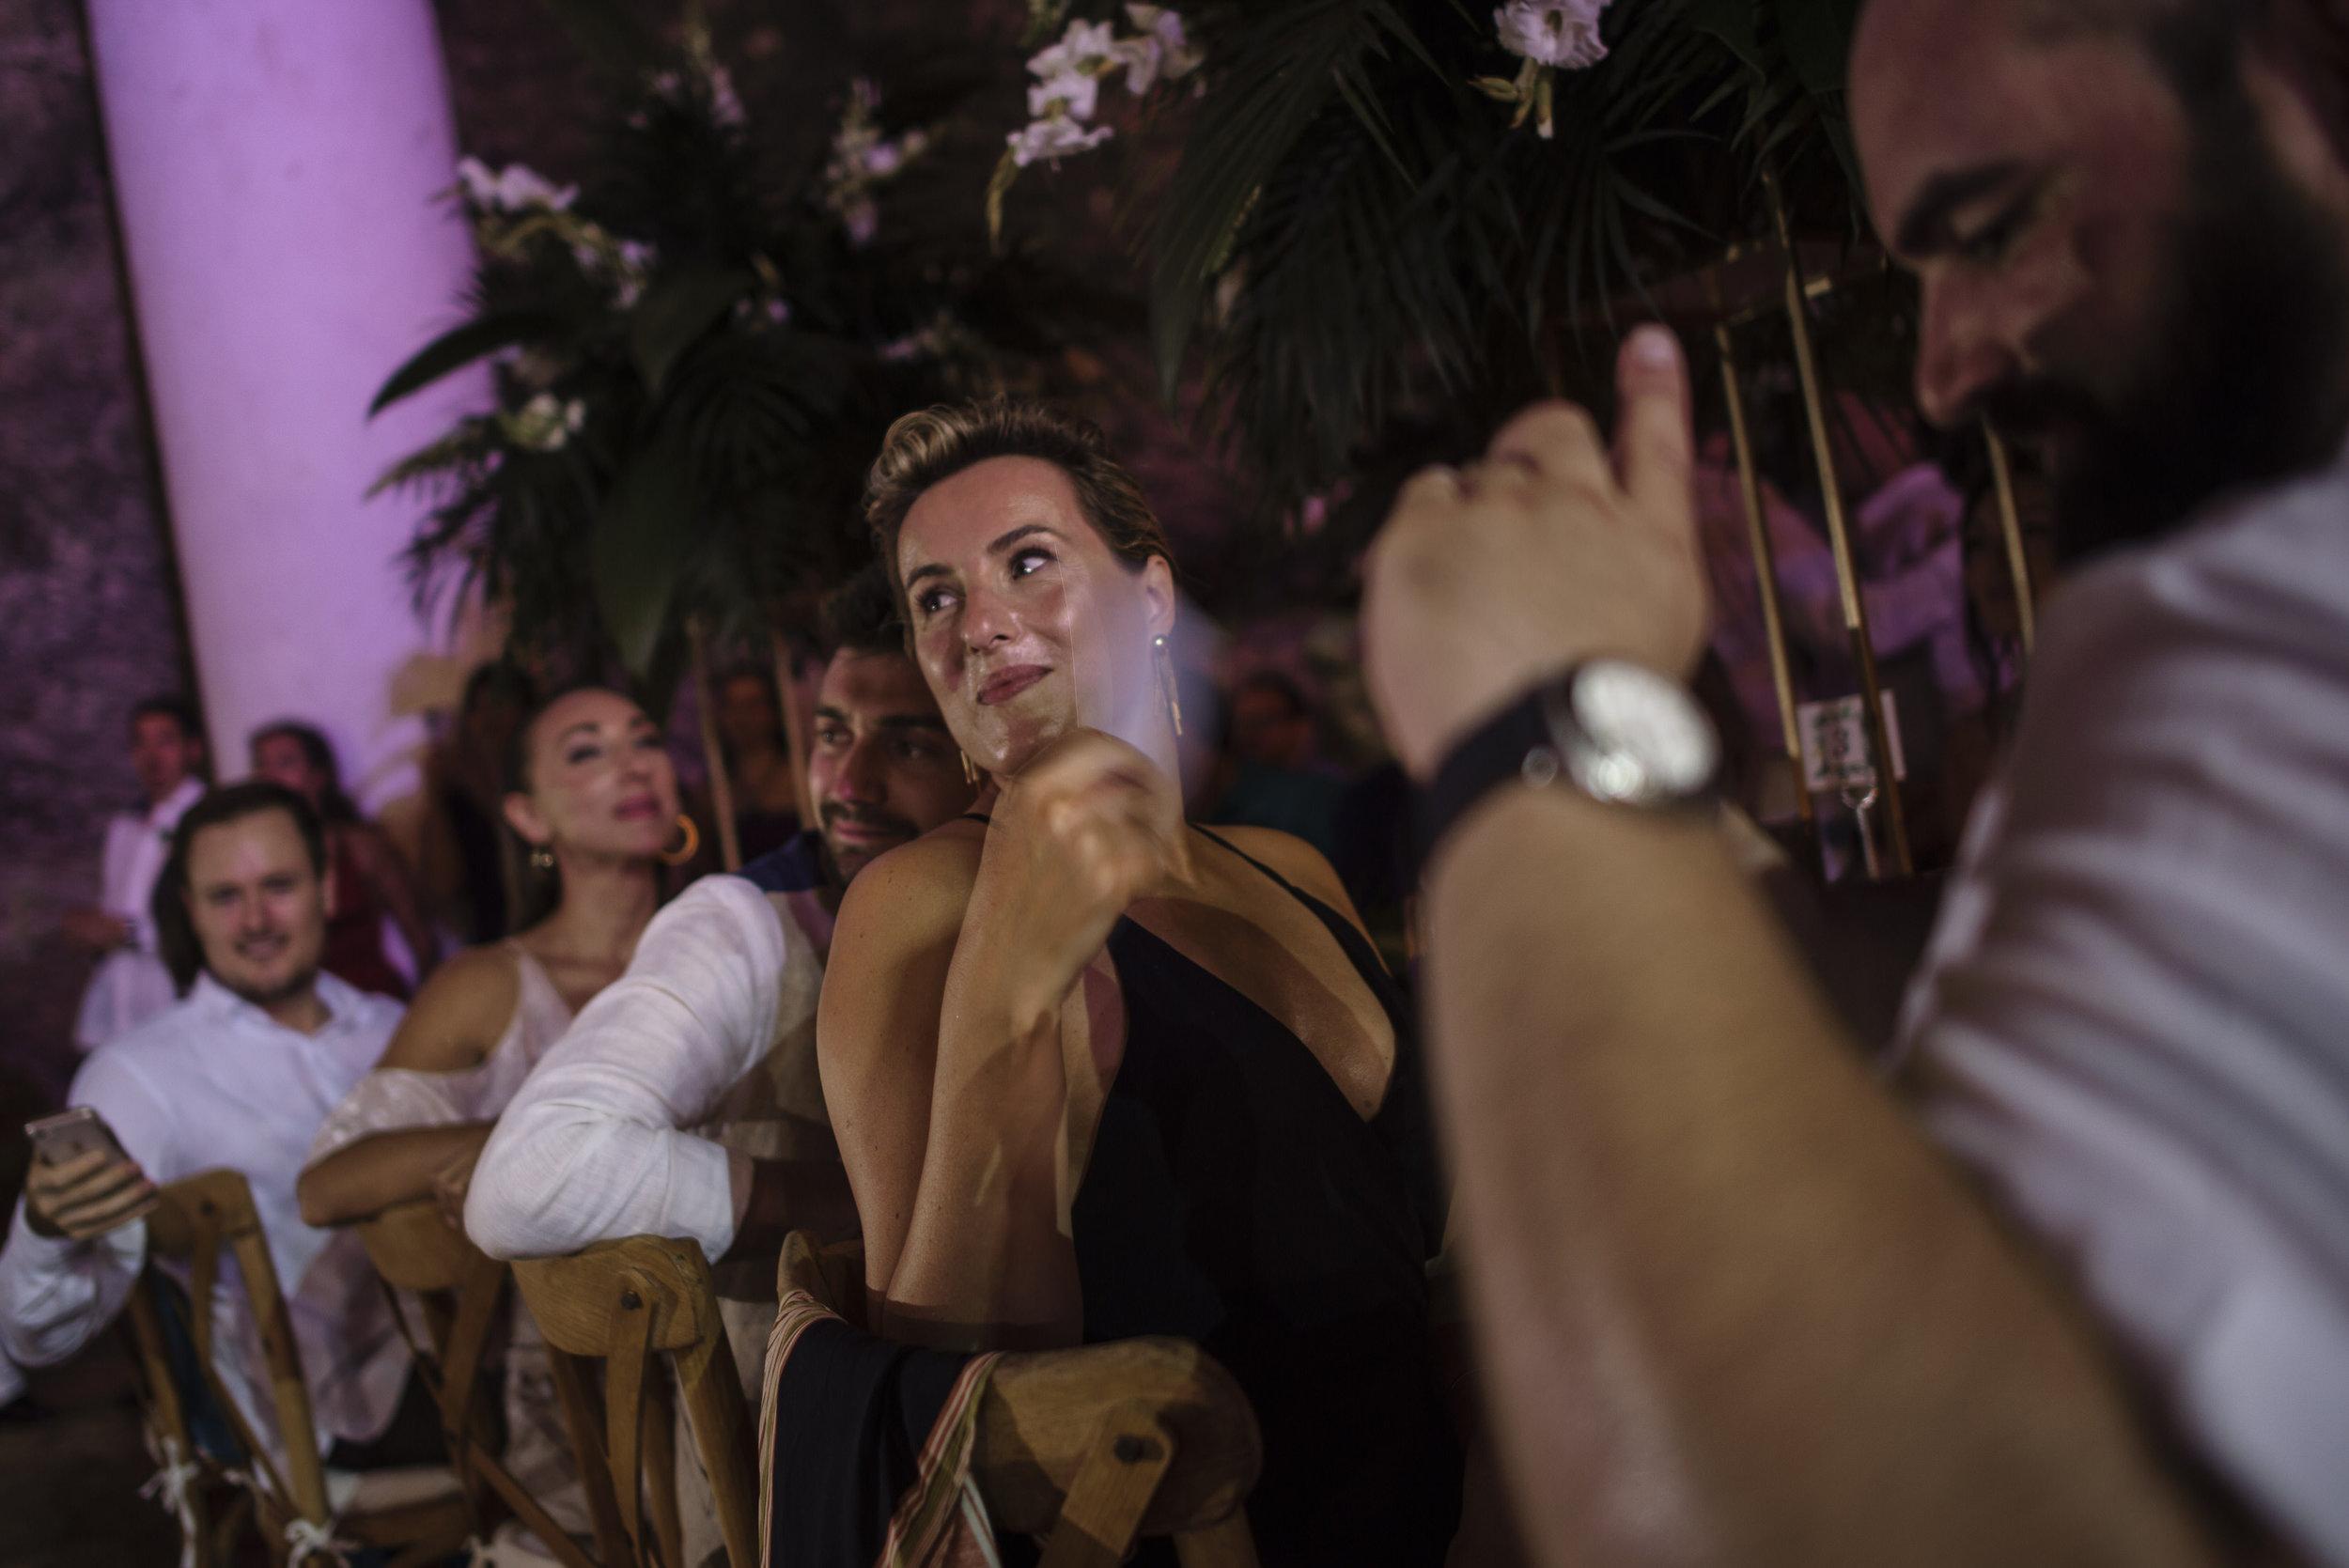 cancun_wedding_photographer_mexico (88).jpg